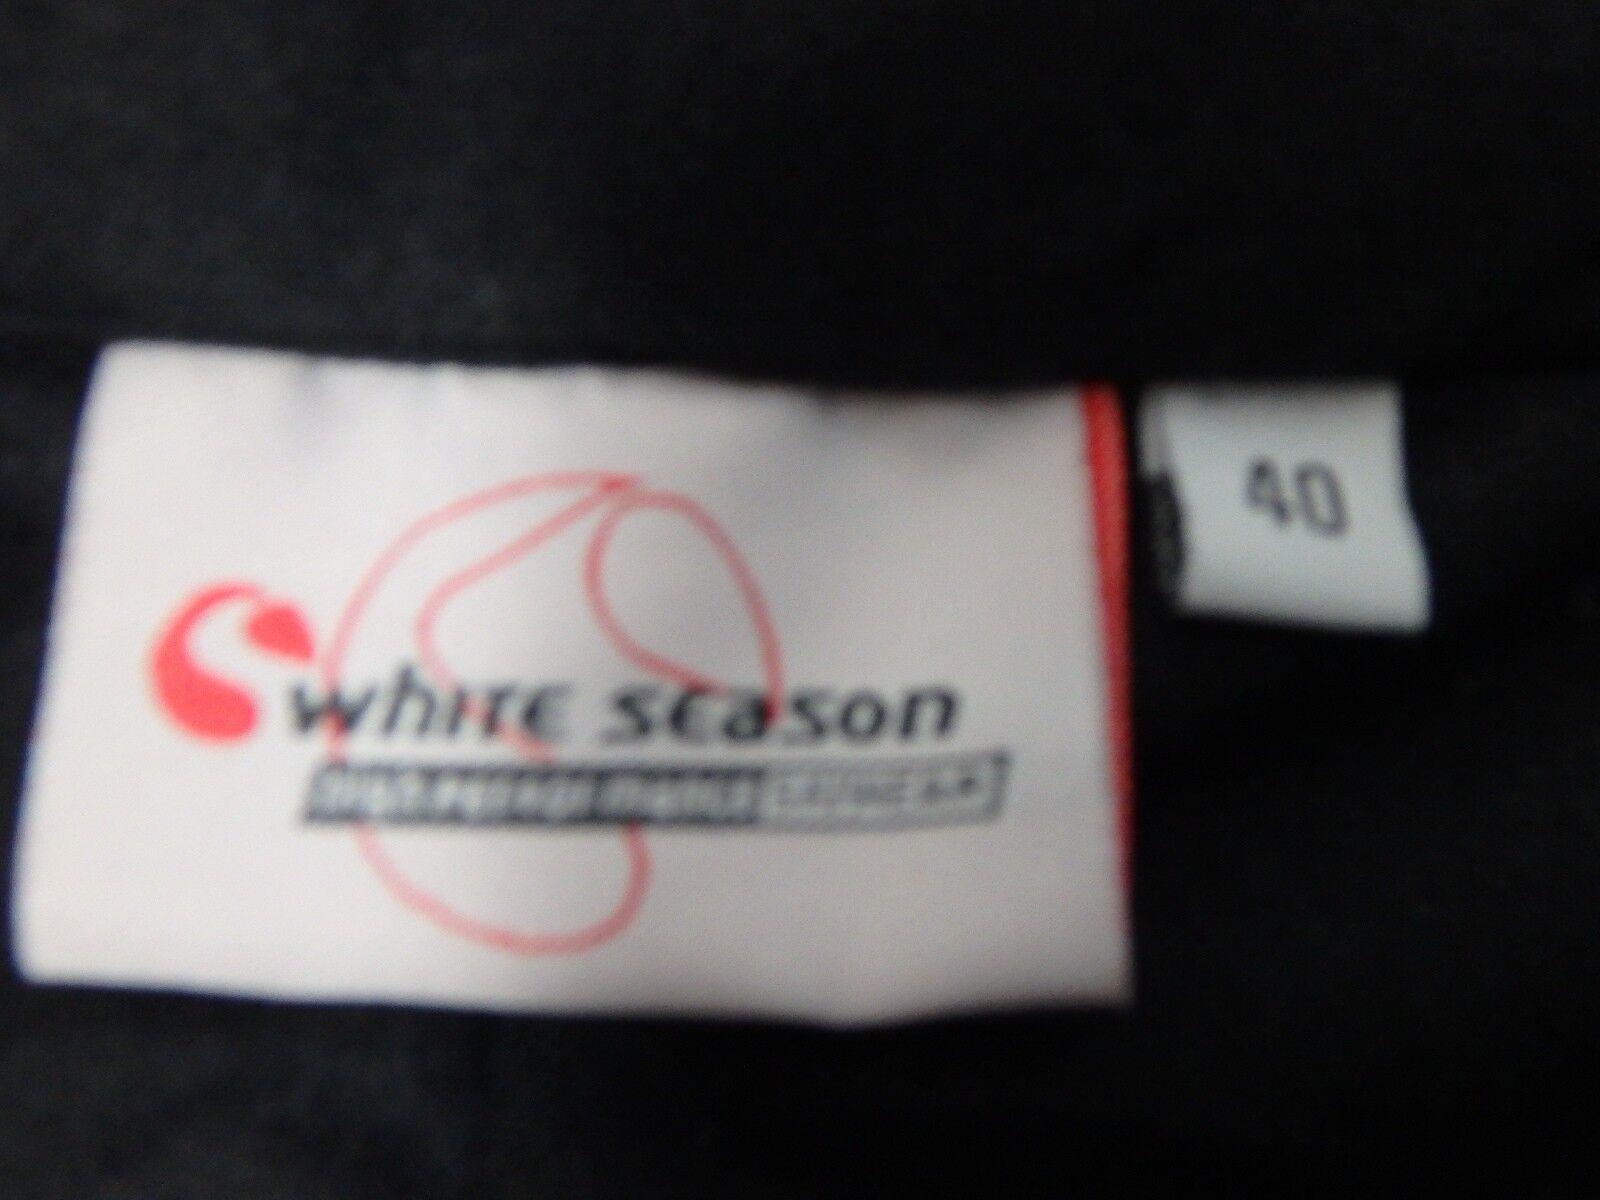 Weiß Season Season Season  27799 Skihose Alpin Hose Ski Winter Snowboard Damen Gr. 40 Weiß 16e38e